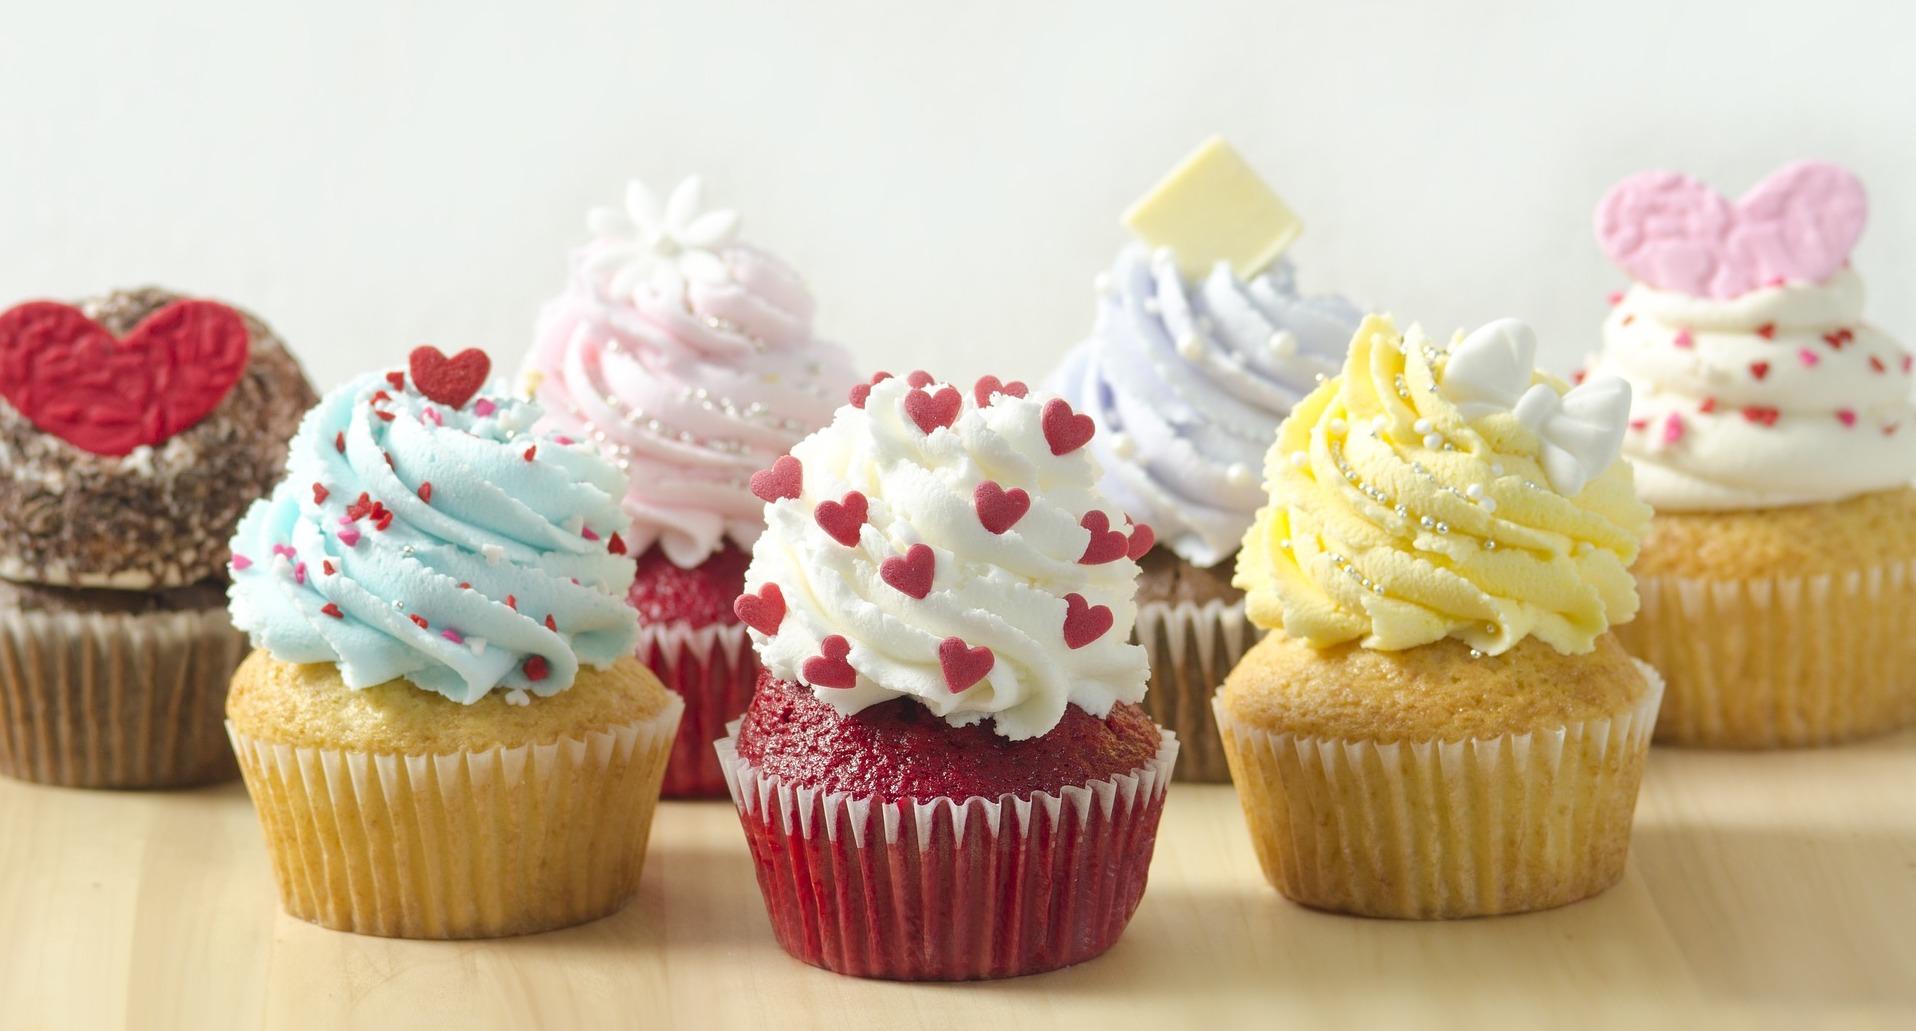 cupcake-3723832_1920